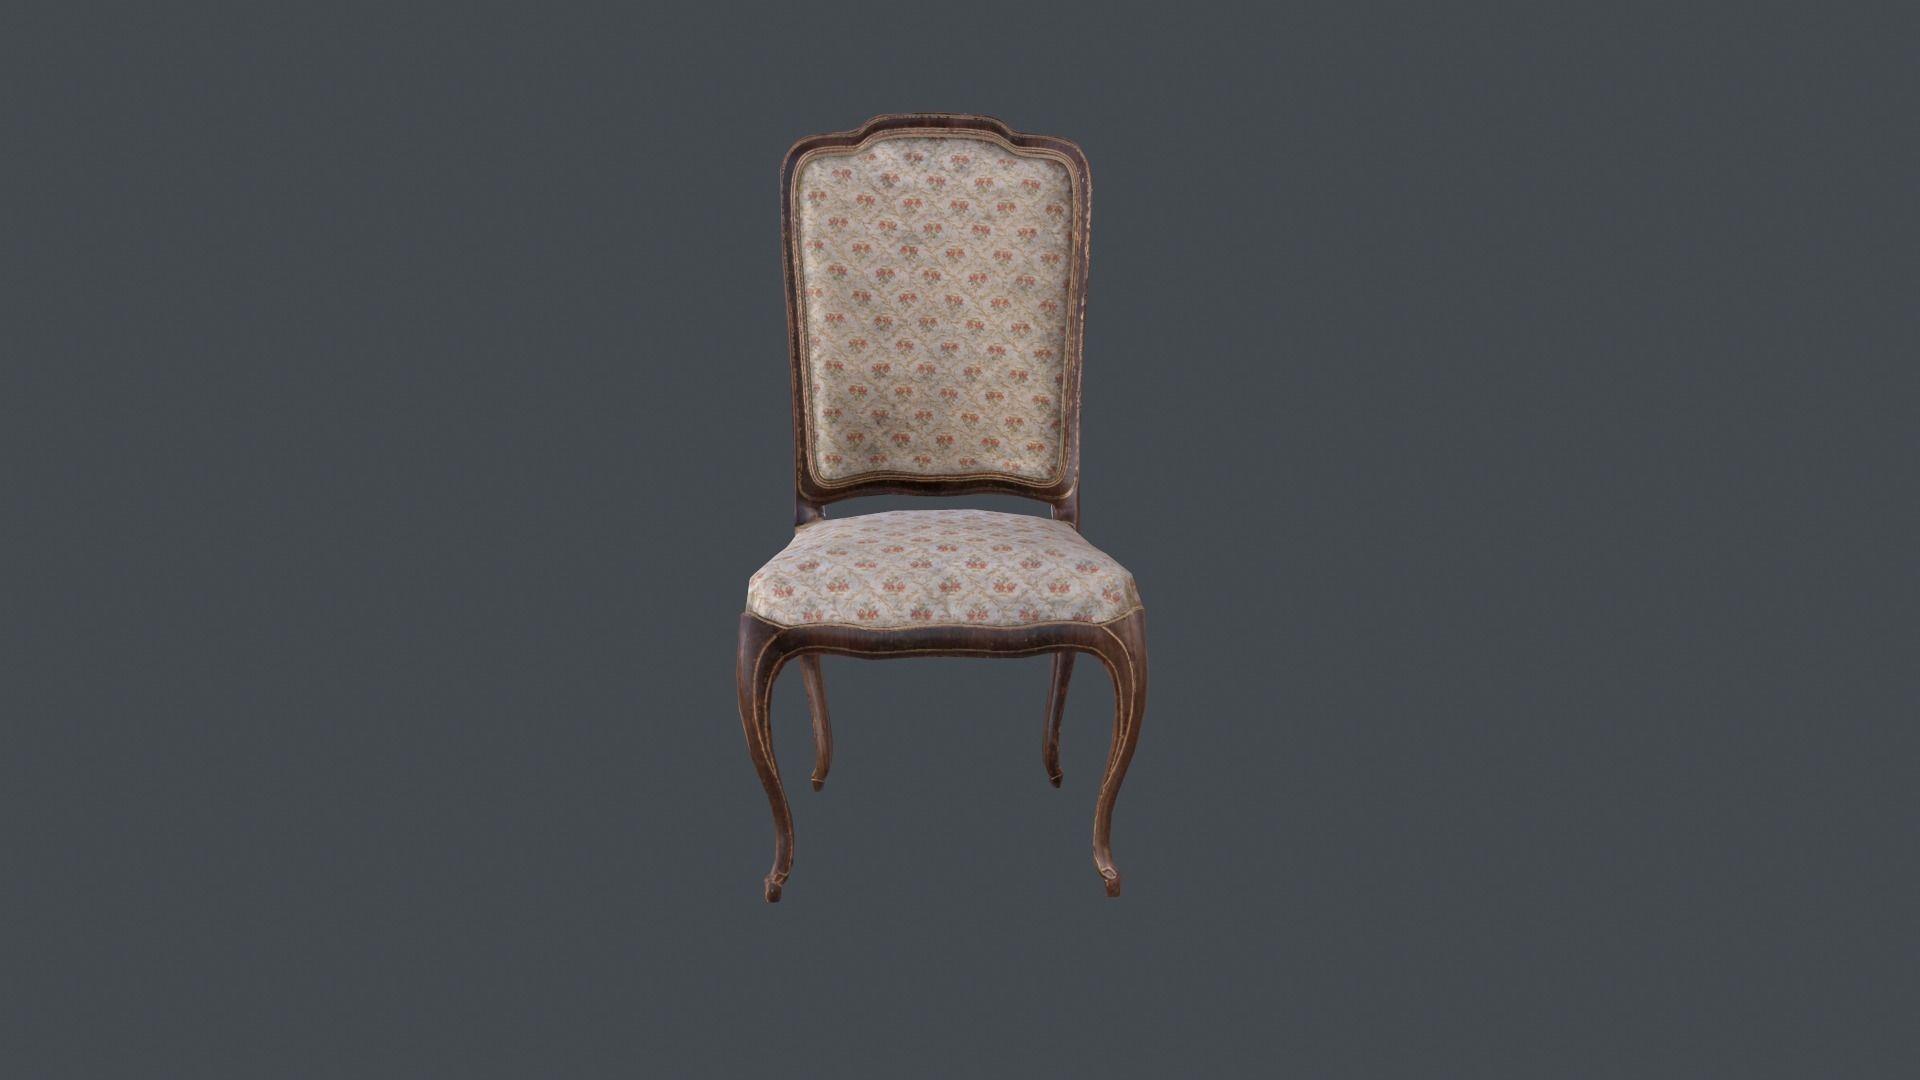 PBR model of  chair